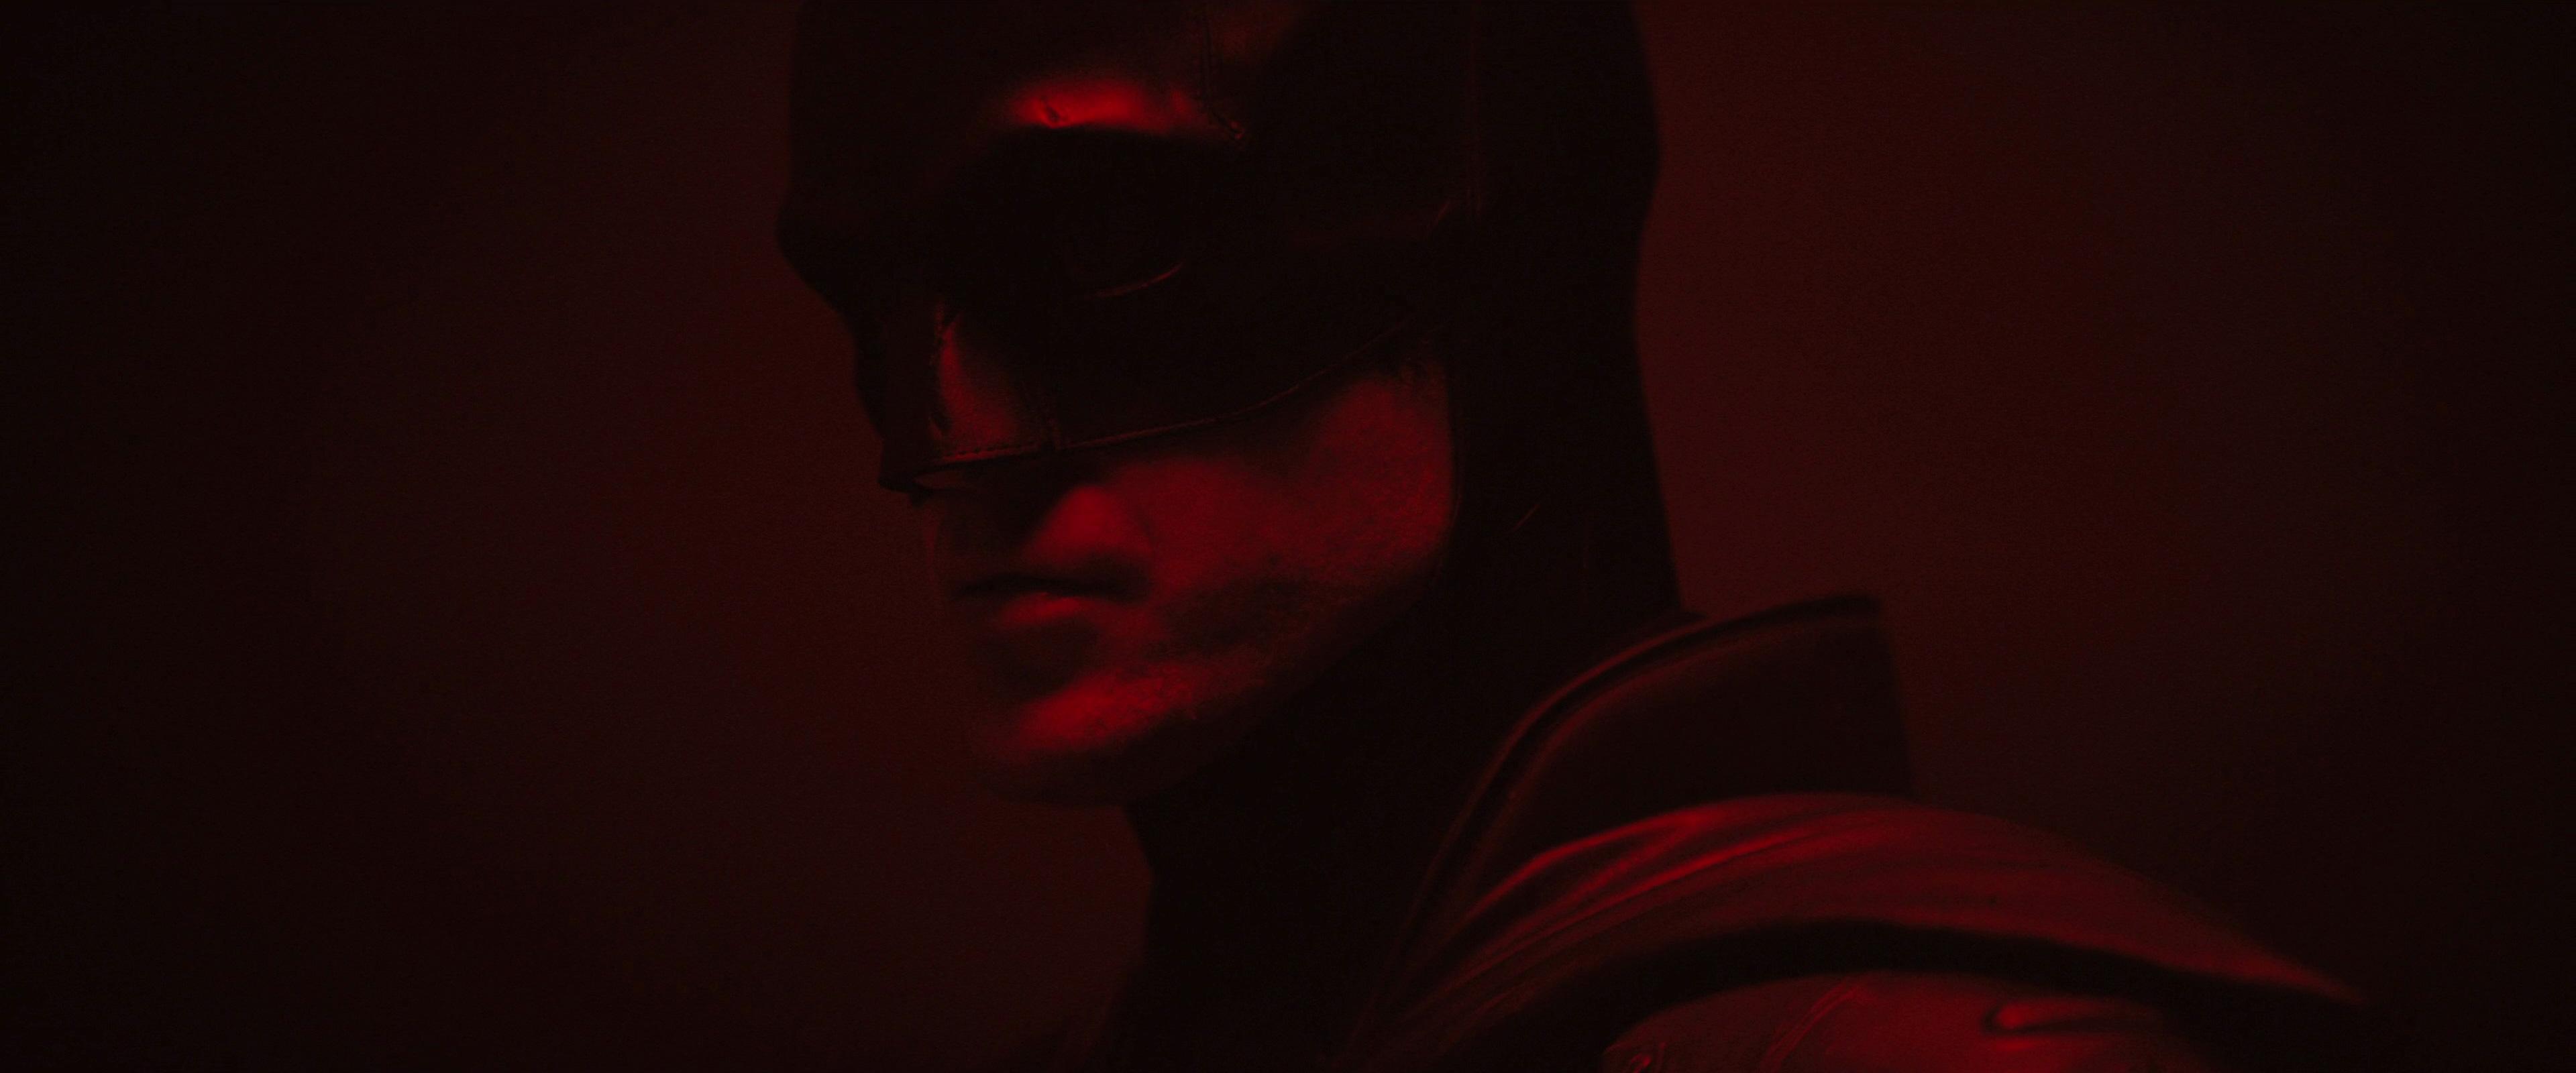 close-up of Robert Pattinson as Batman in a dark red room in The Batman